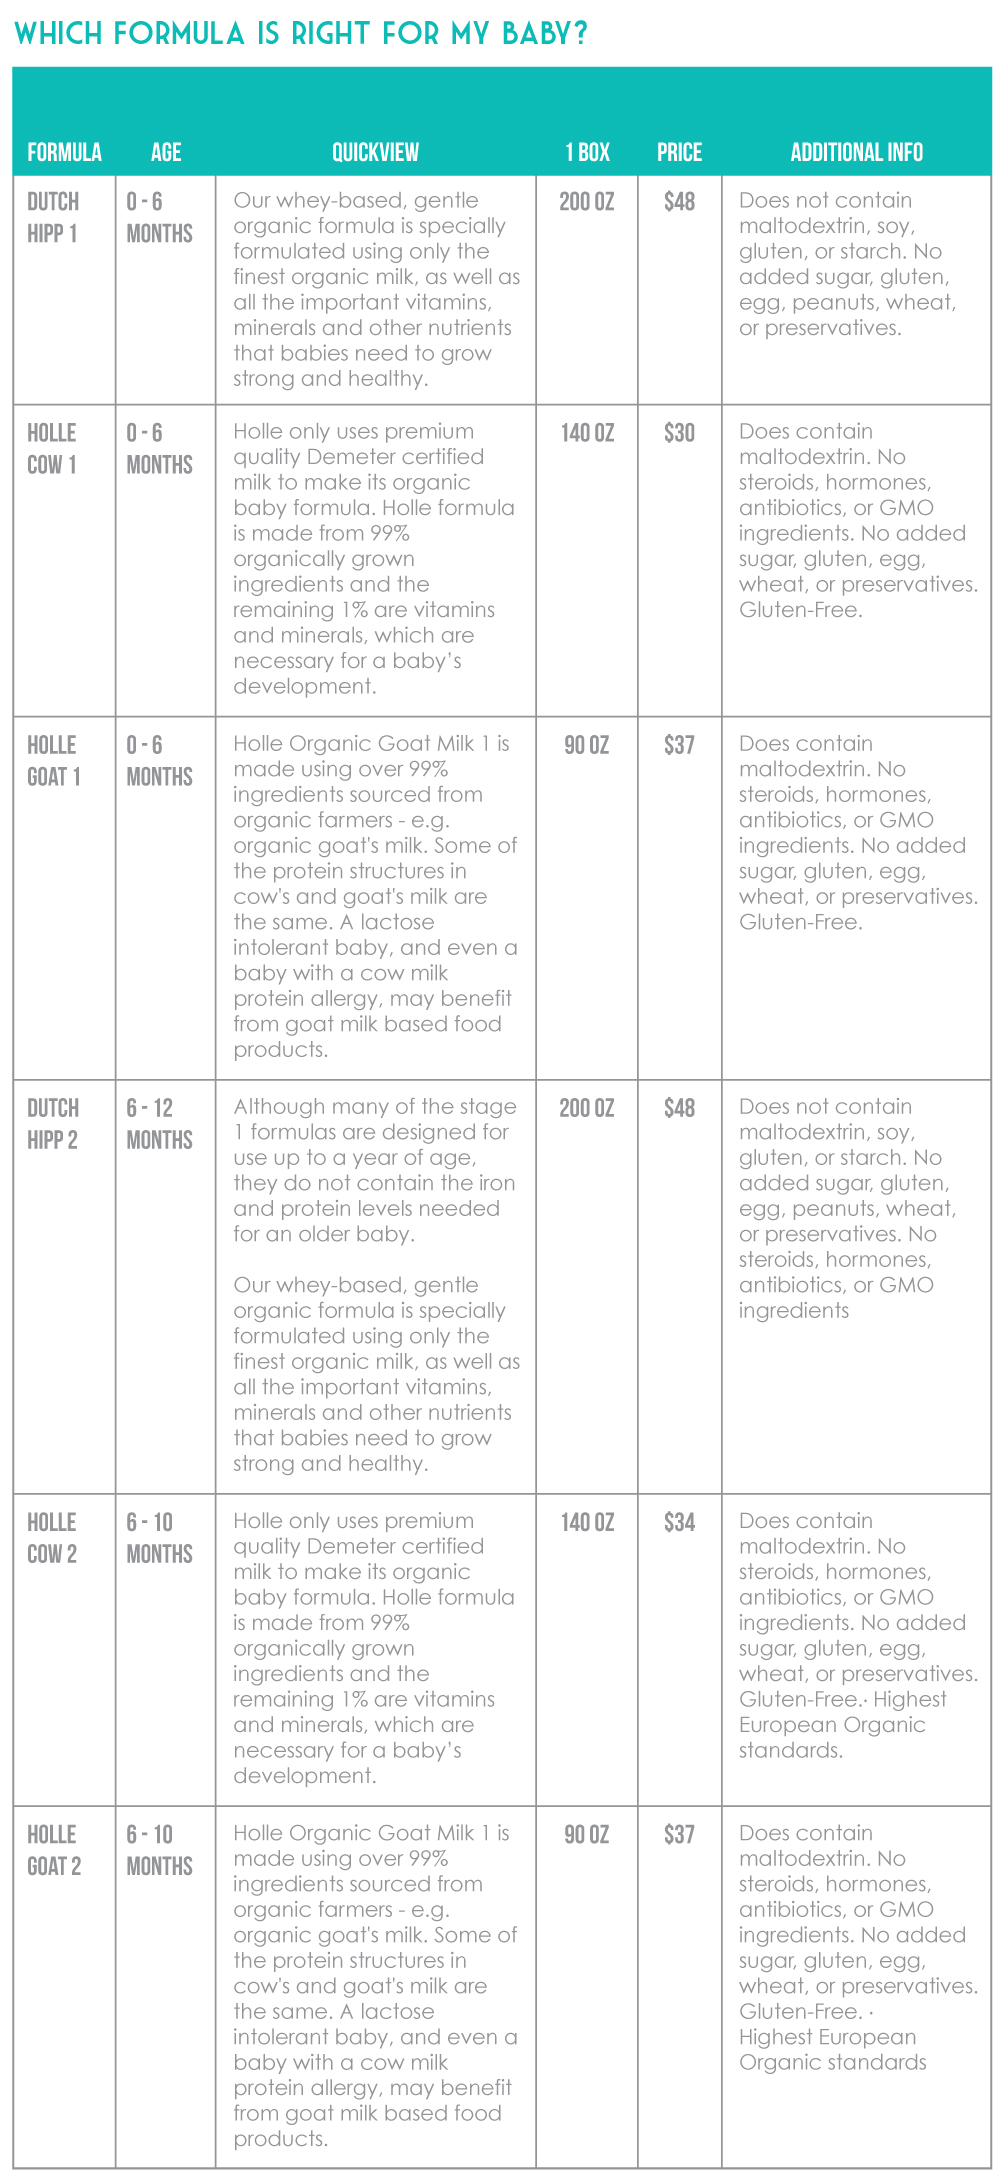 HippHolle-Formula-Info-Chart.jpg